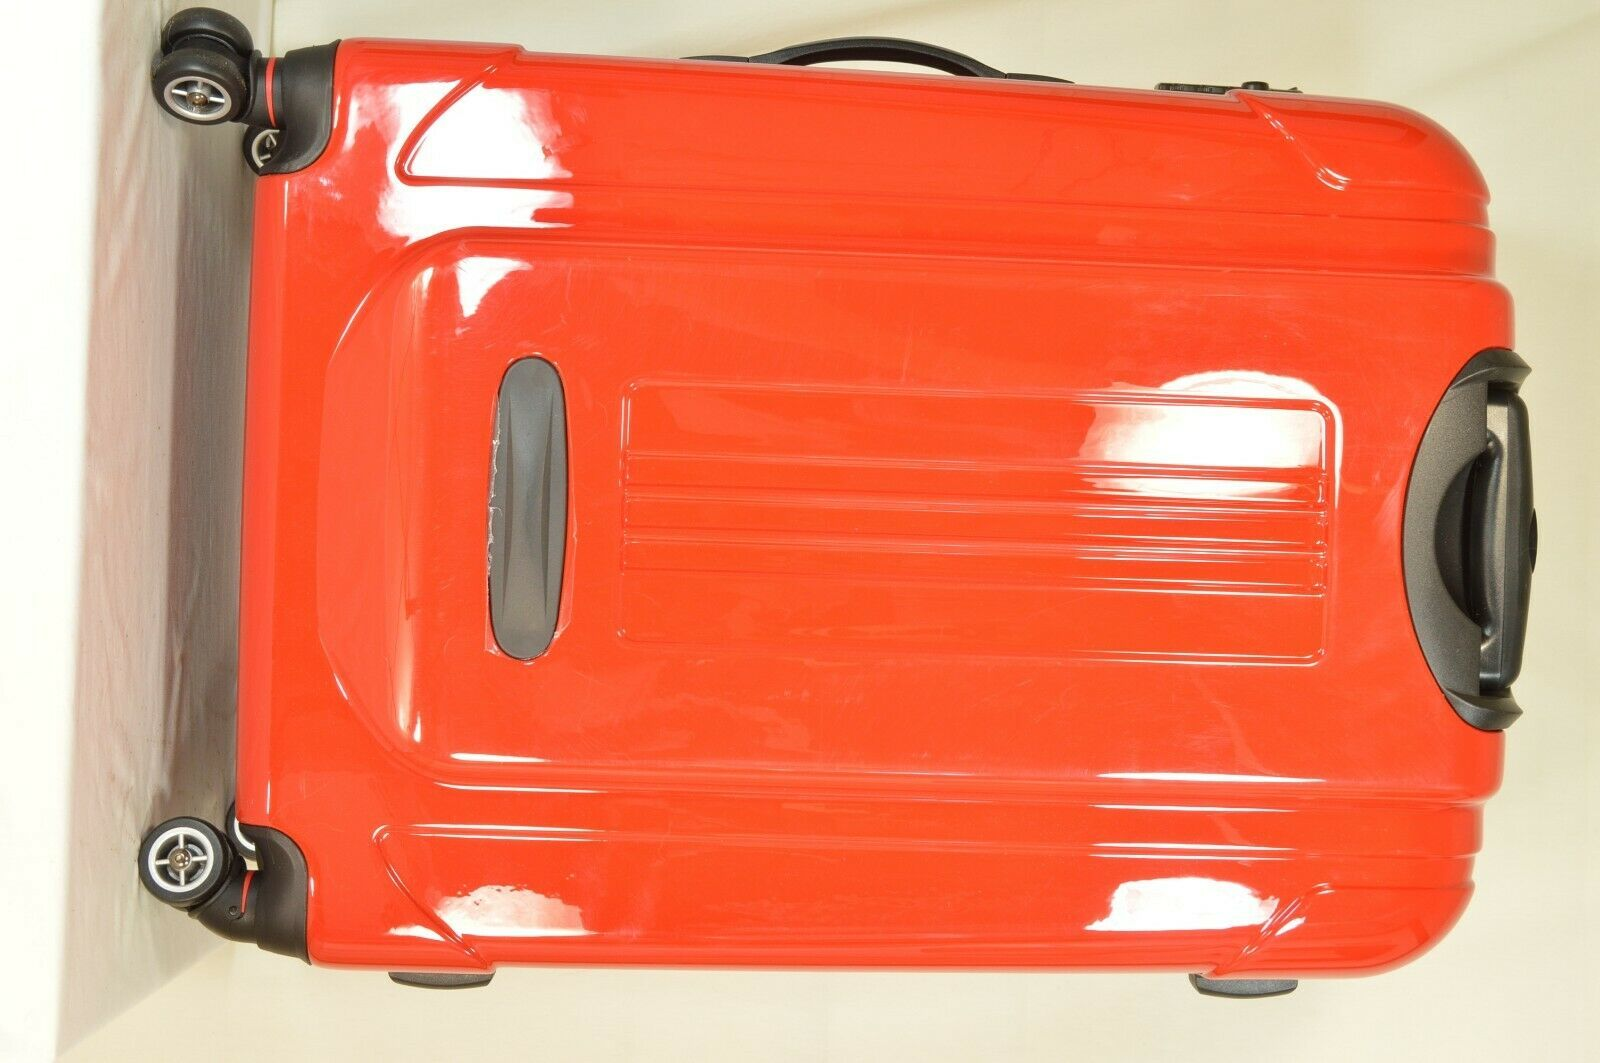 "Traveler's Choice 29"" Sedona new spinner red polycarbonate shell combo lock image 8"